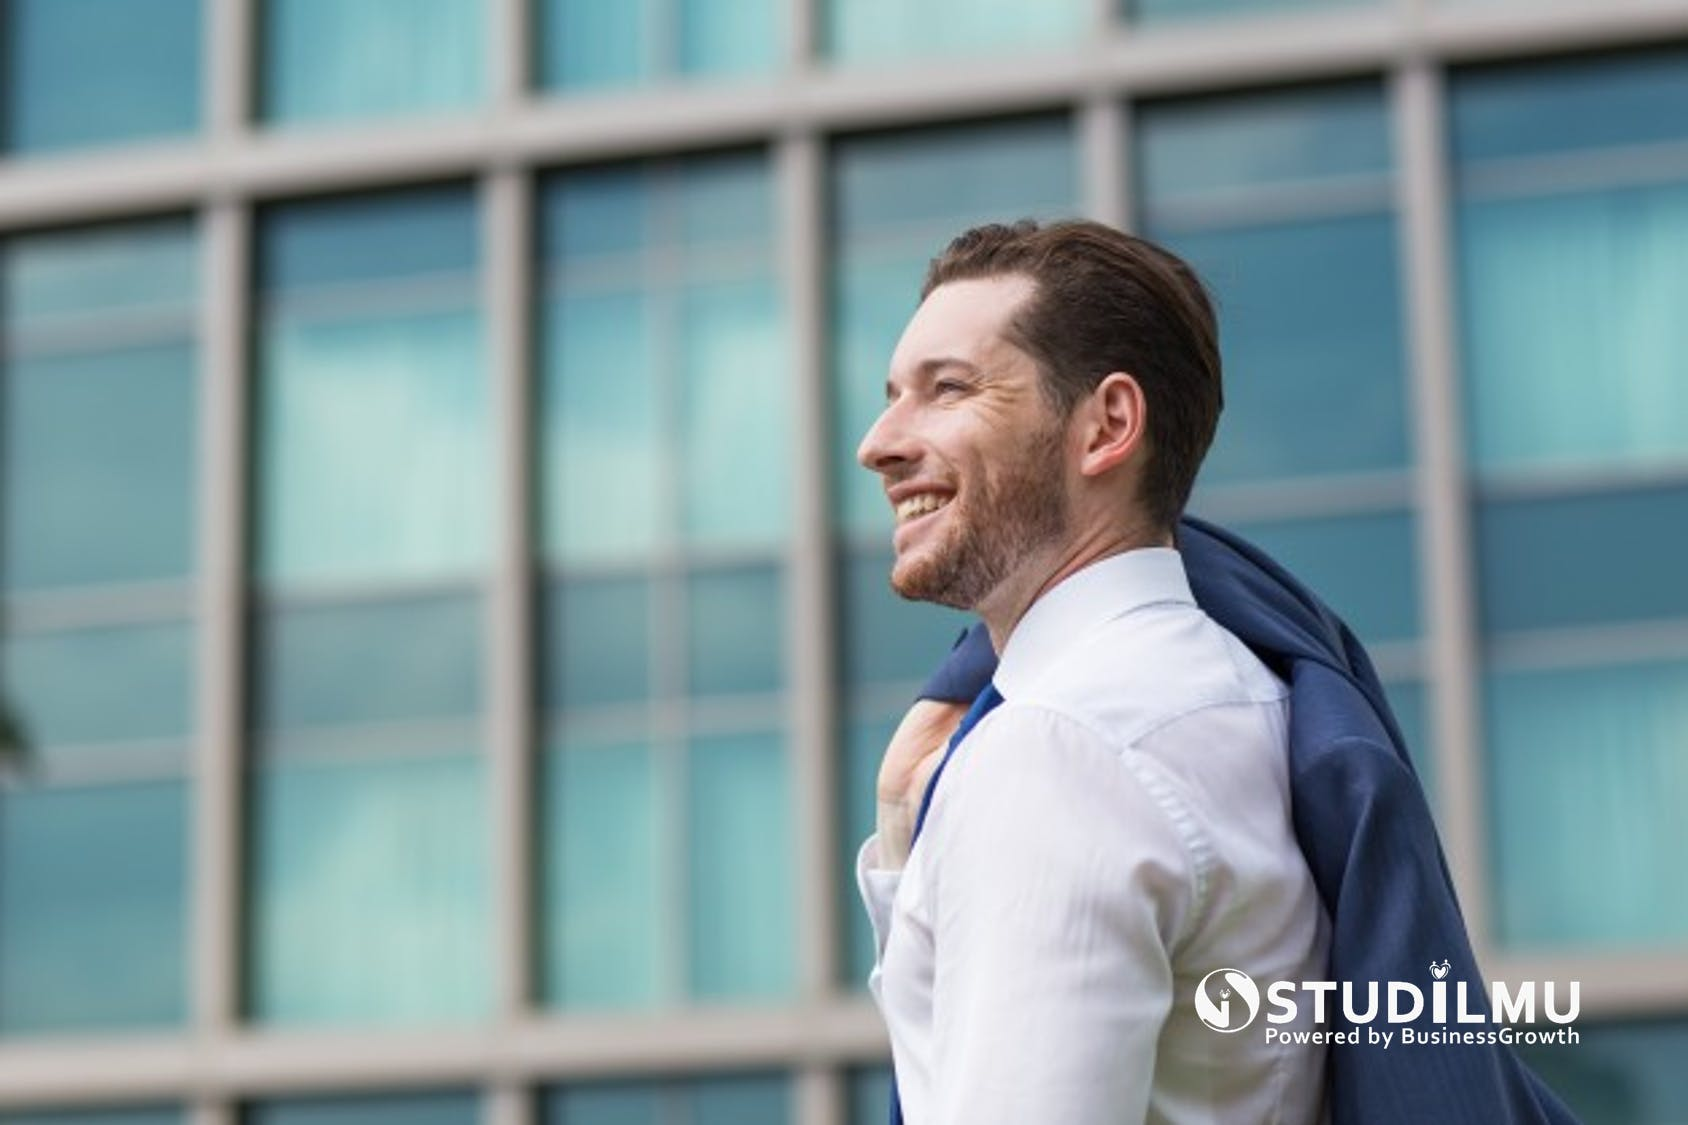 STUDILMU Career Advice - Kriteria Pemimpin yang Memiliki Executive Presence